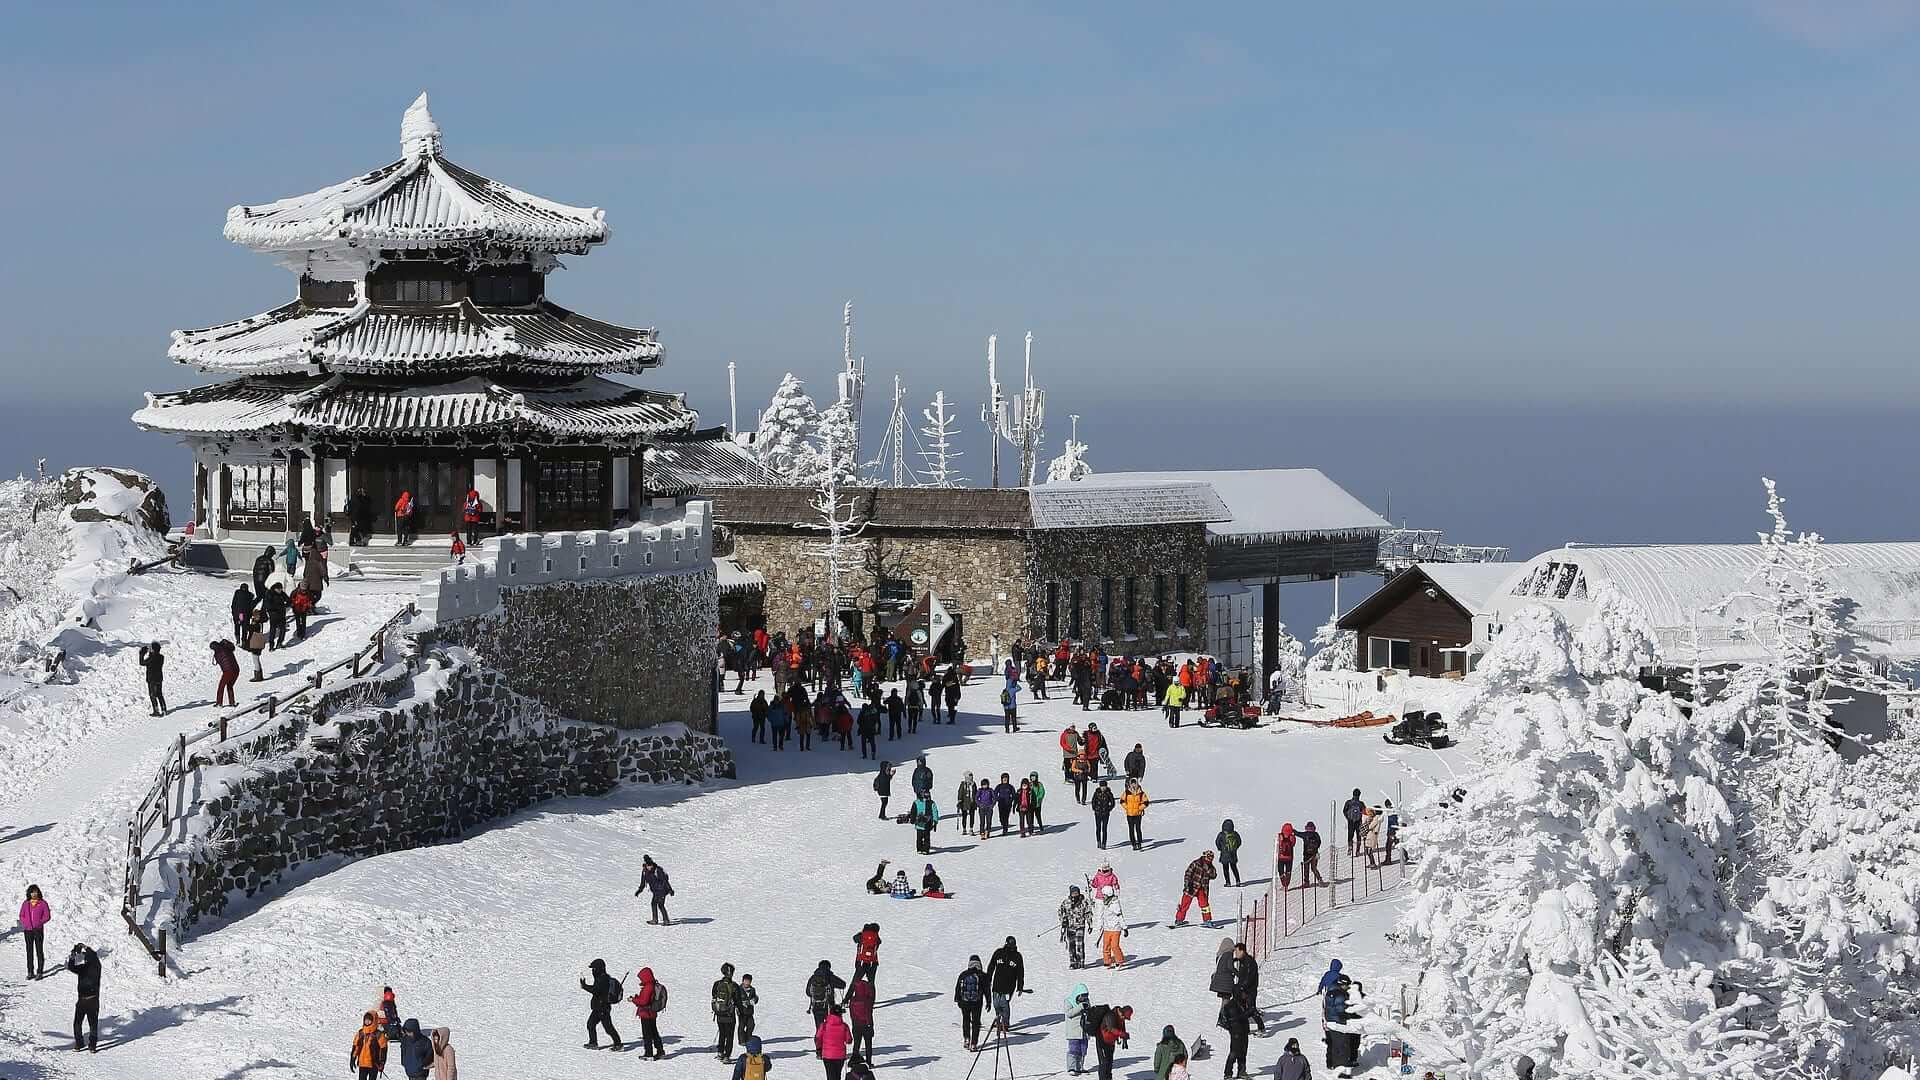 Korea – Winter Olympics 2018 have begun!